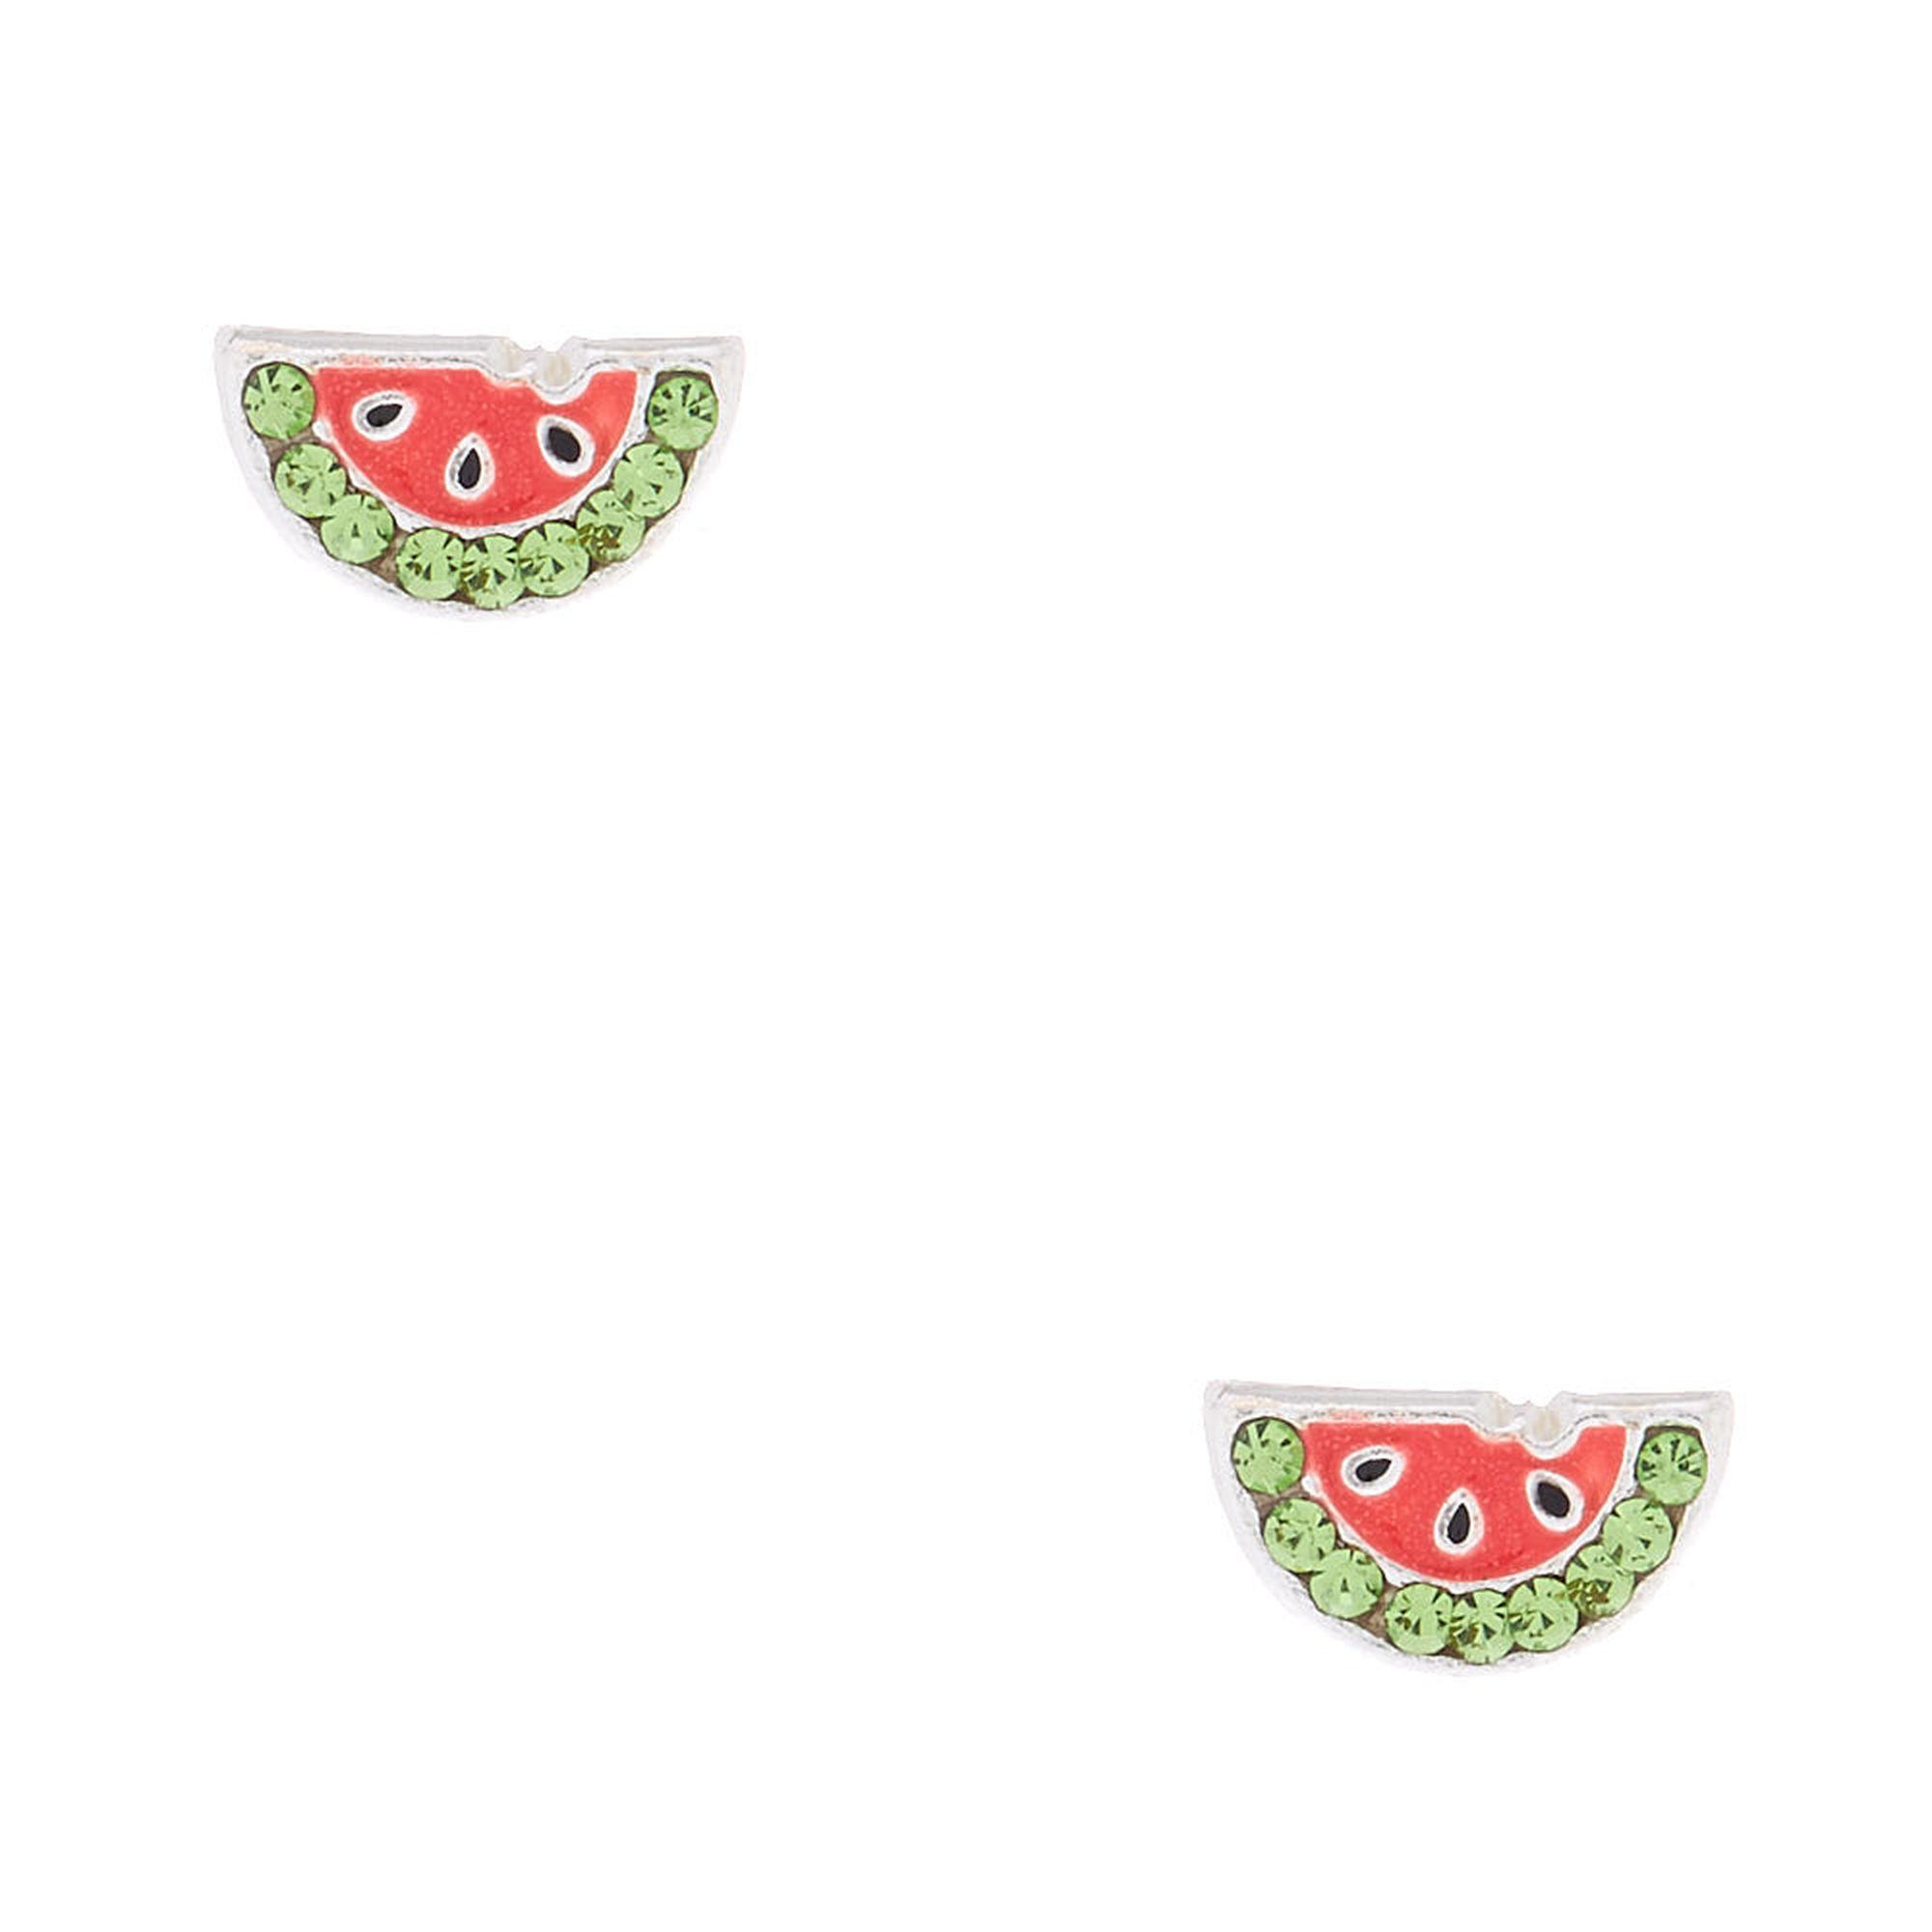 Claire's watermelon earrings